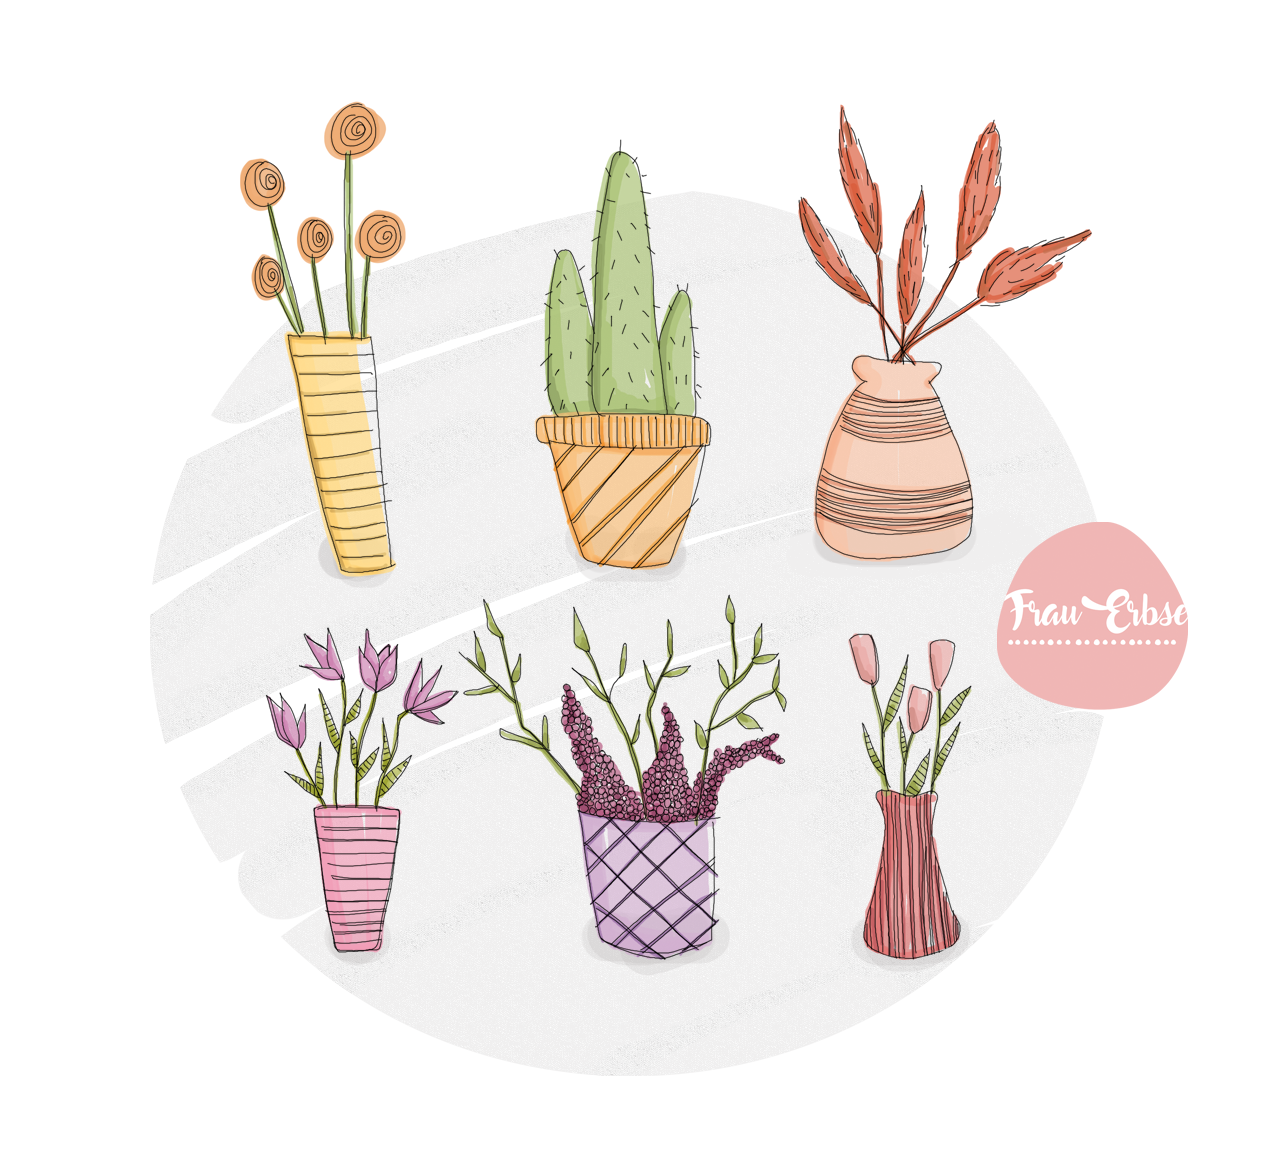 Pflanzenillustration